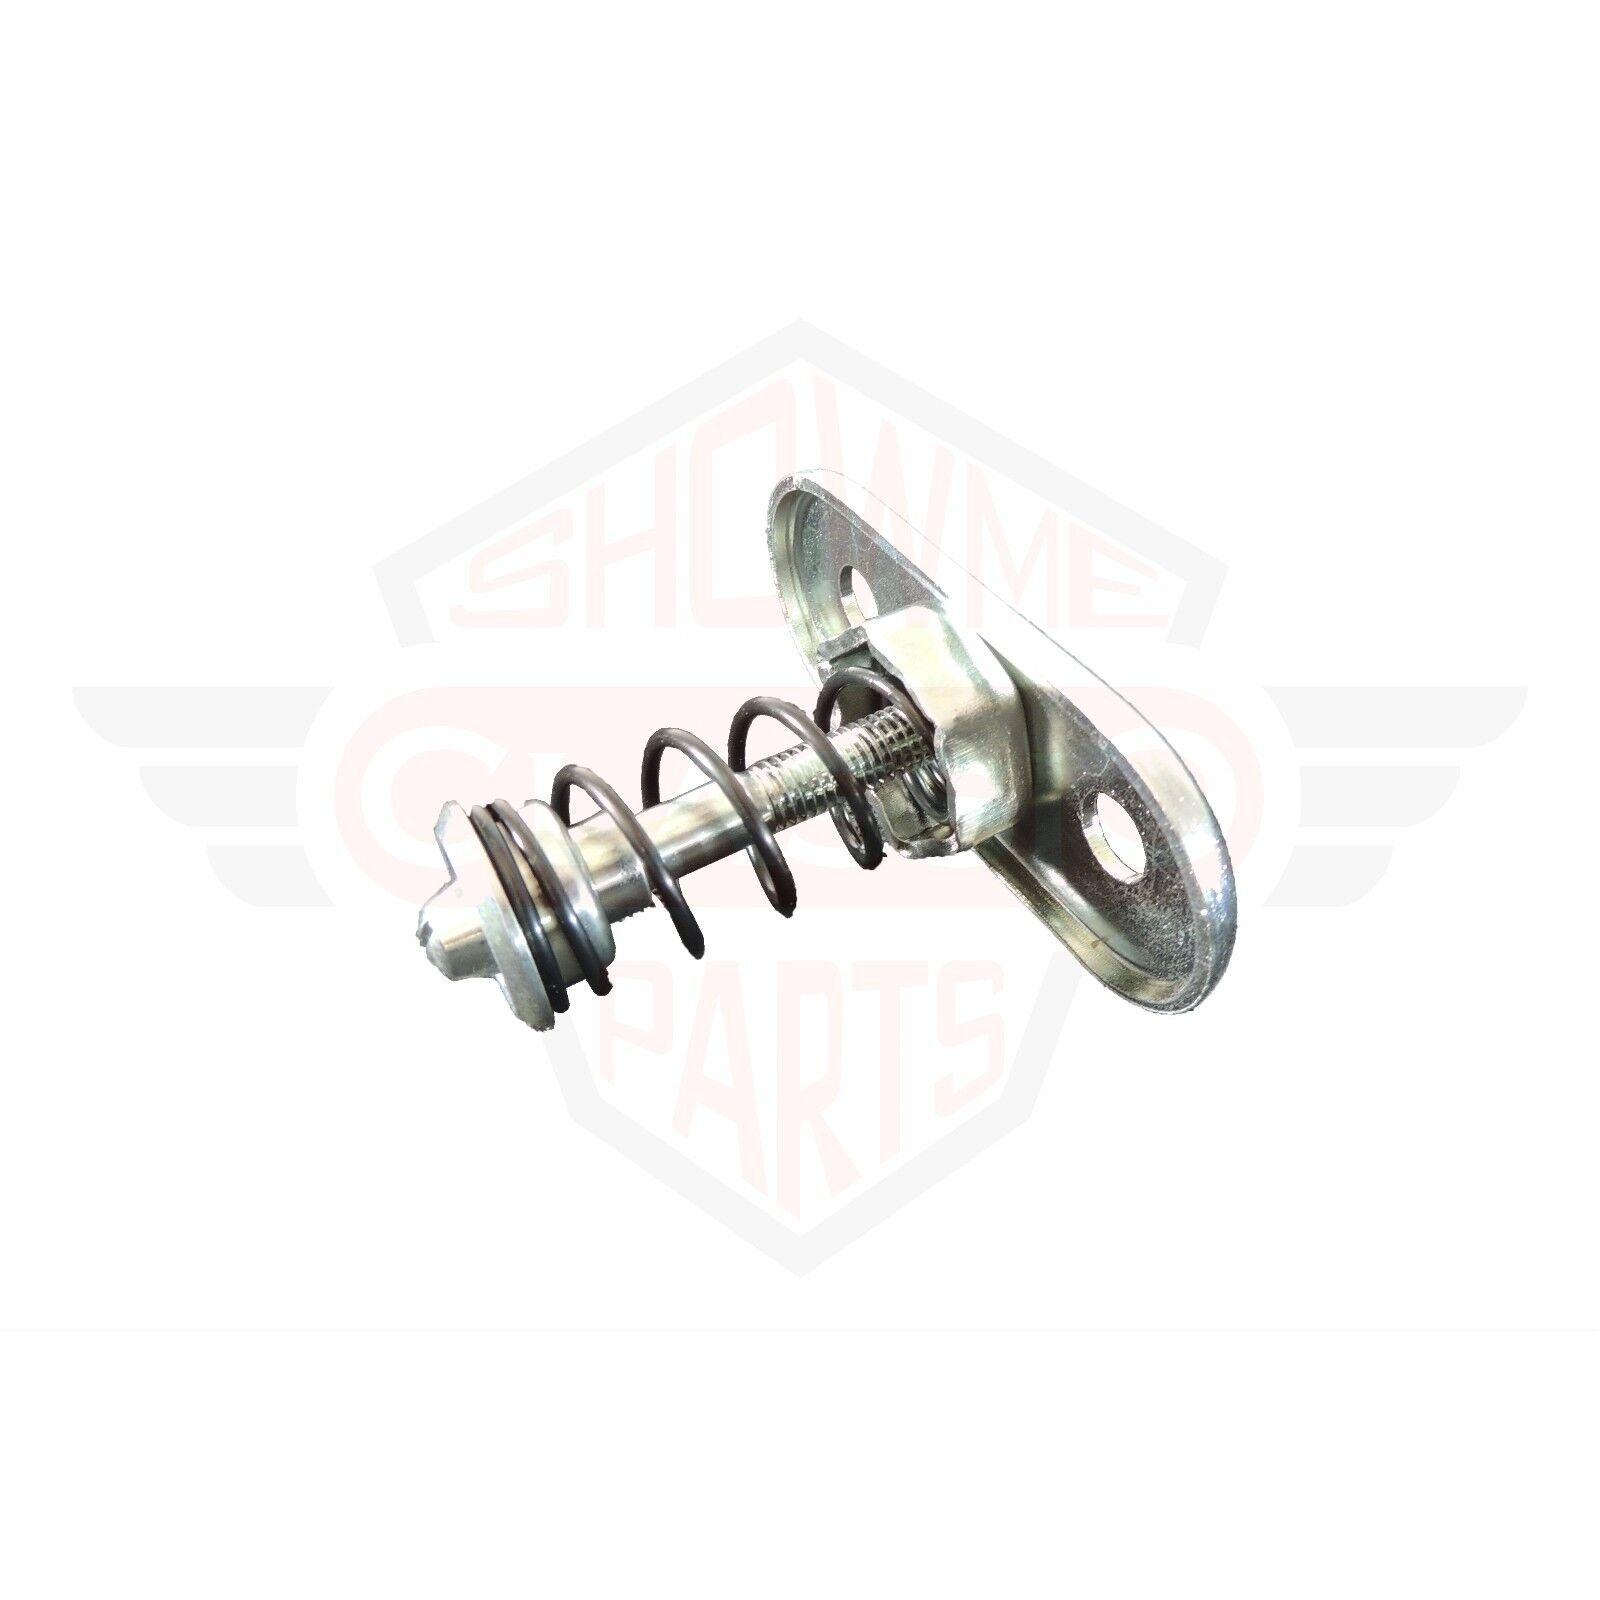 Rear Engine / Deck Lid Upper Latch For 1965-1989 65-89